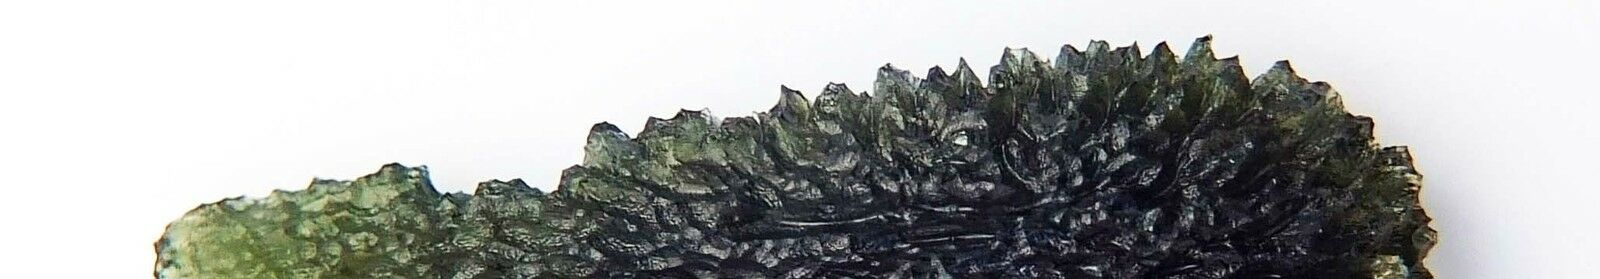 Moldavite Miner